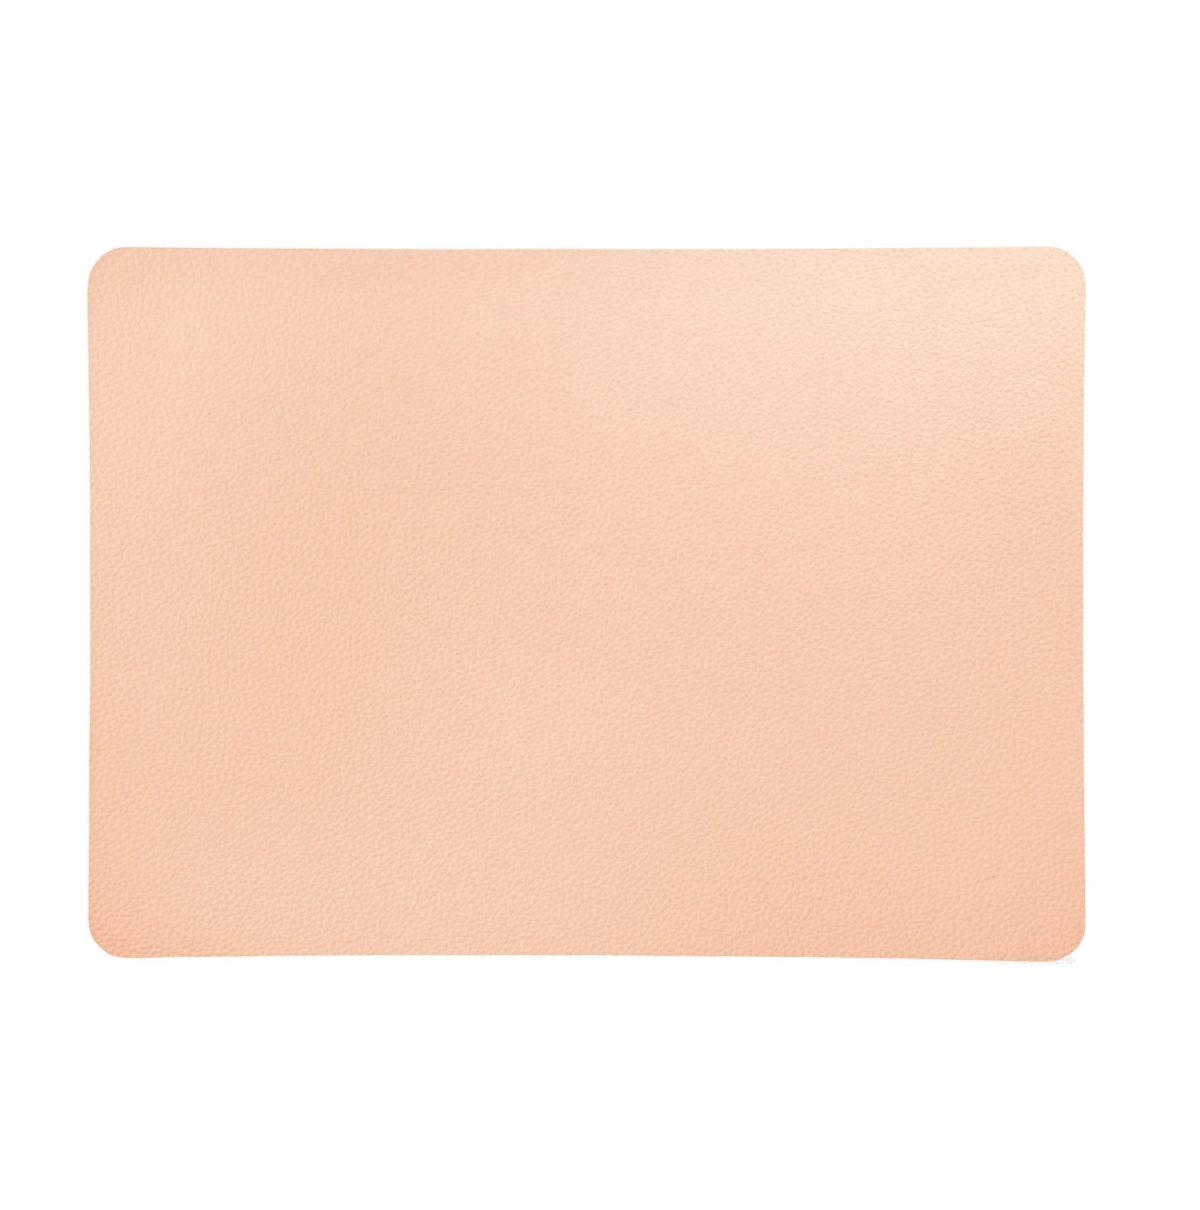 7821420 balletslipper 1200x1210 - Placemat Leather optic fine ballet slipper 46*33 cm (7821420)